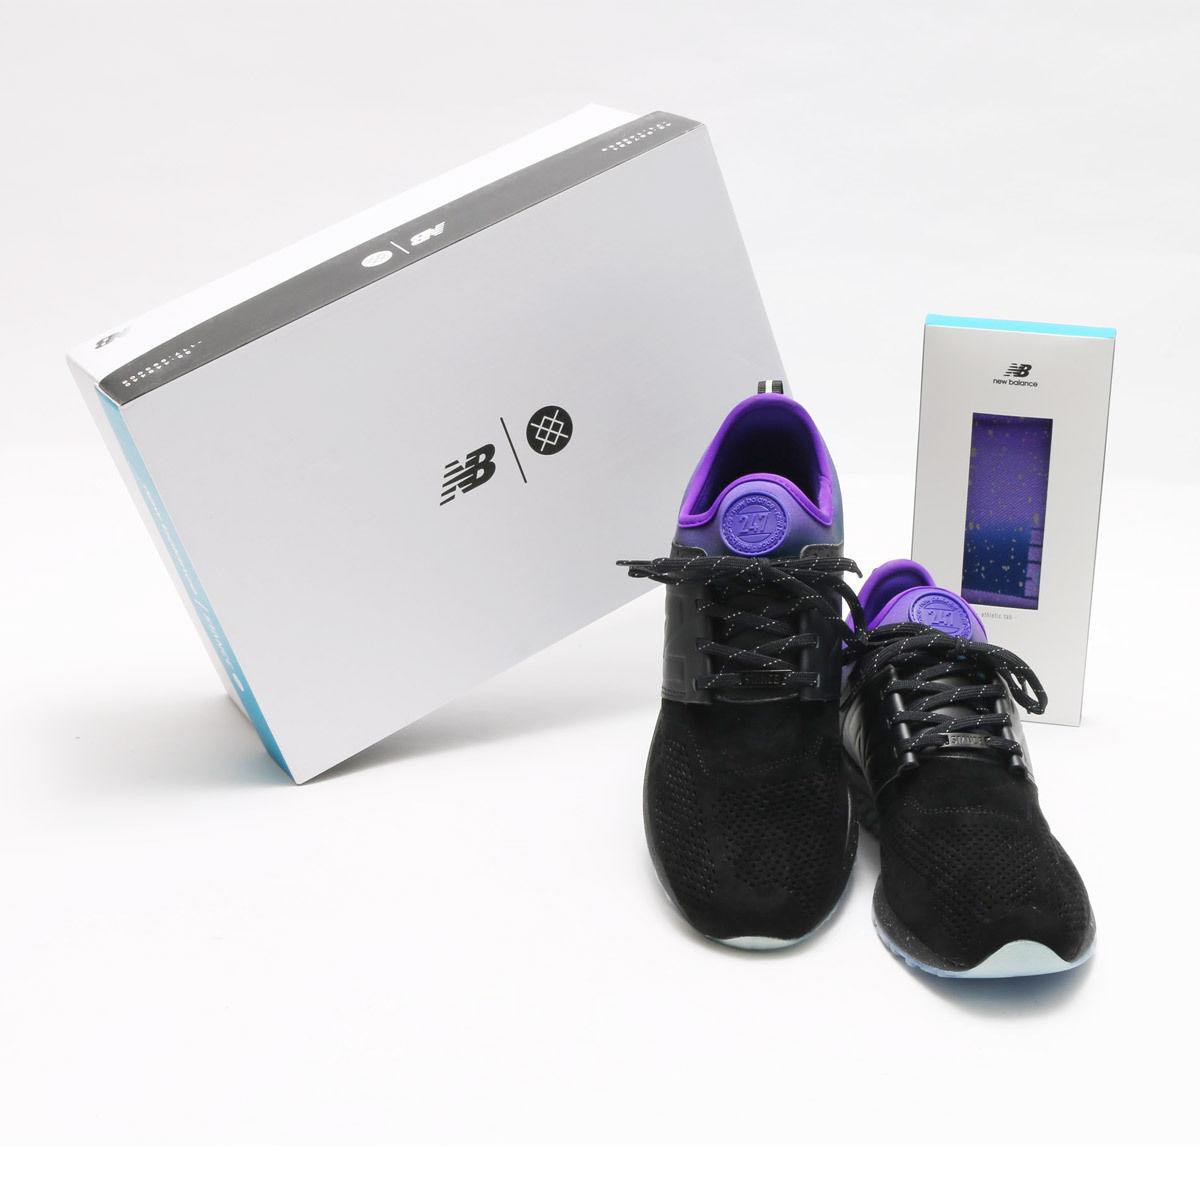 New Balance 247 X Stance Socken All Day Pack Pack Pack Schwarze Limitierte Auflage Schuhe   f8bd4e